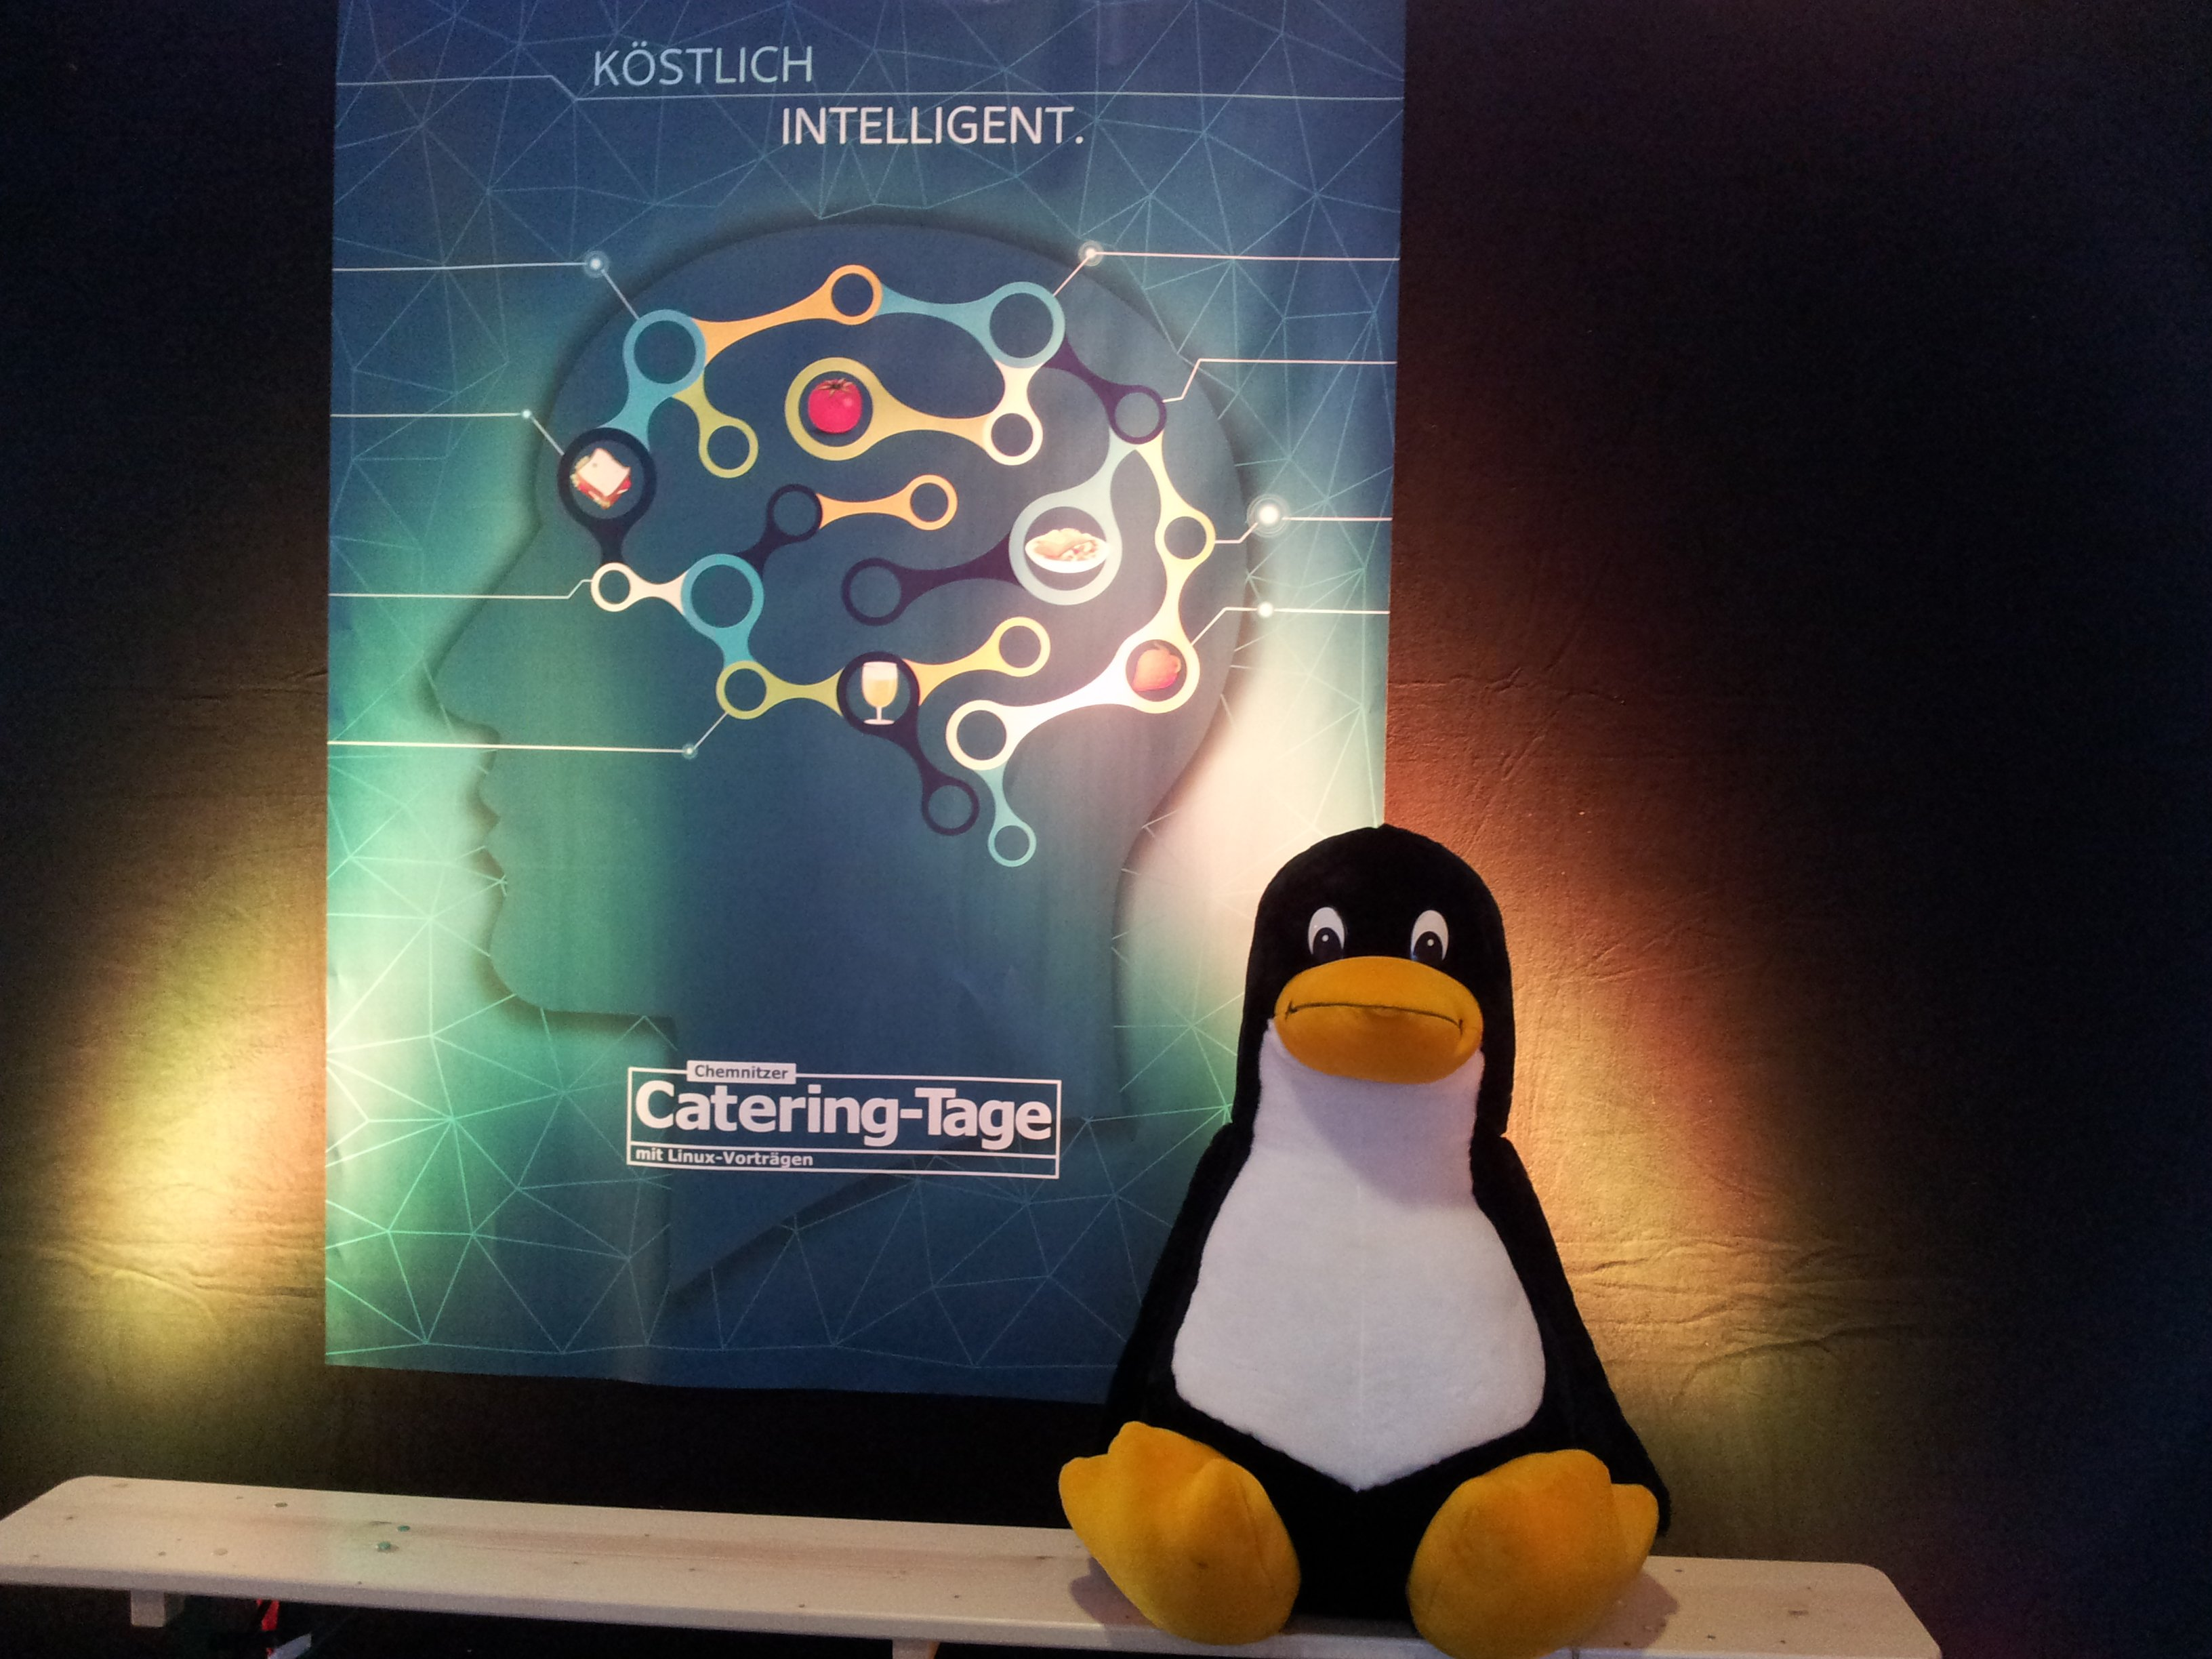 Chemnitzer Linuxtage 2019